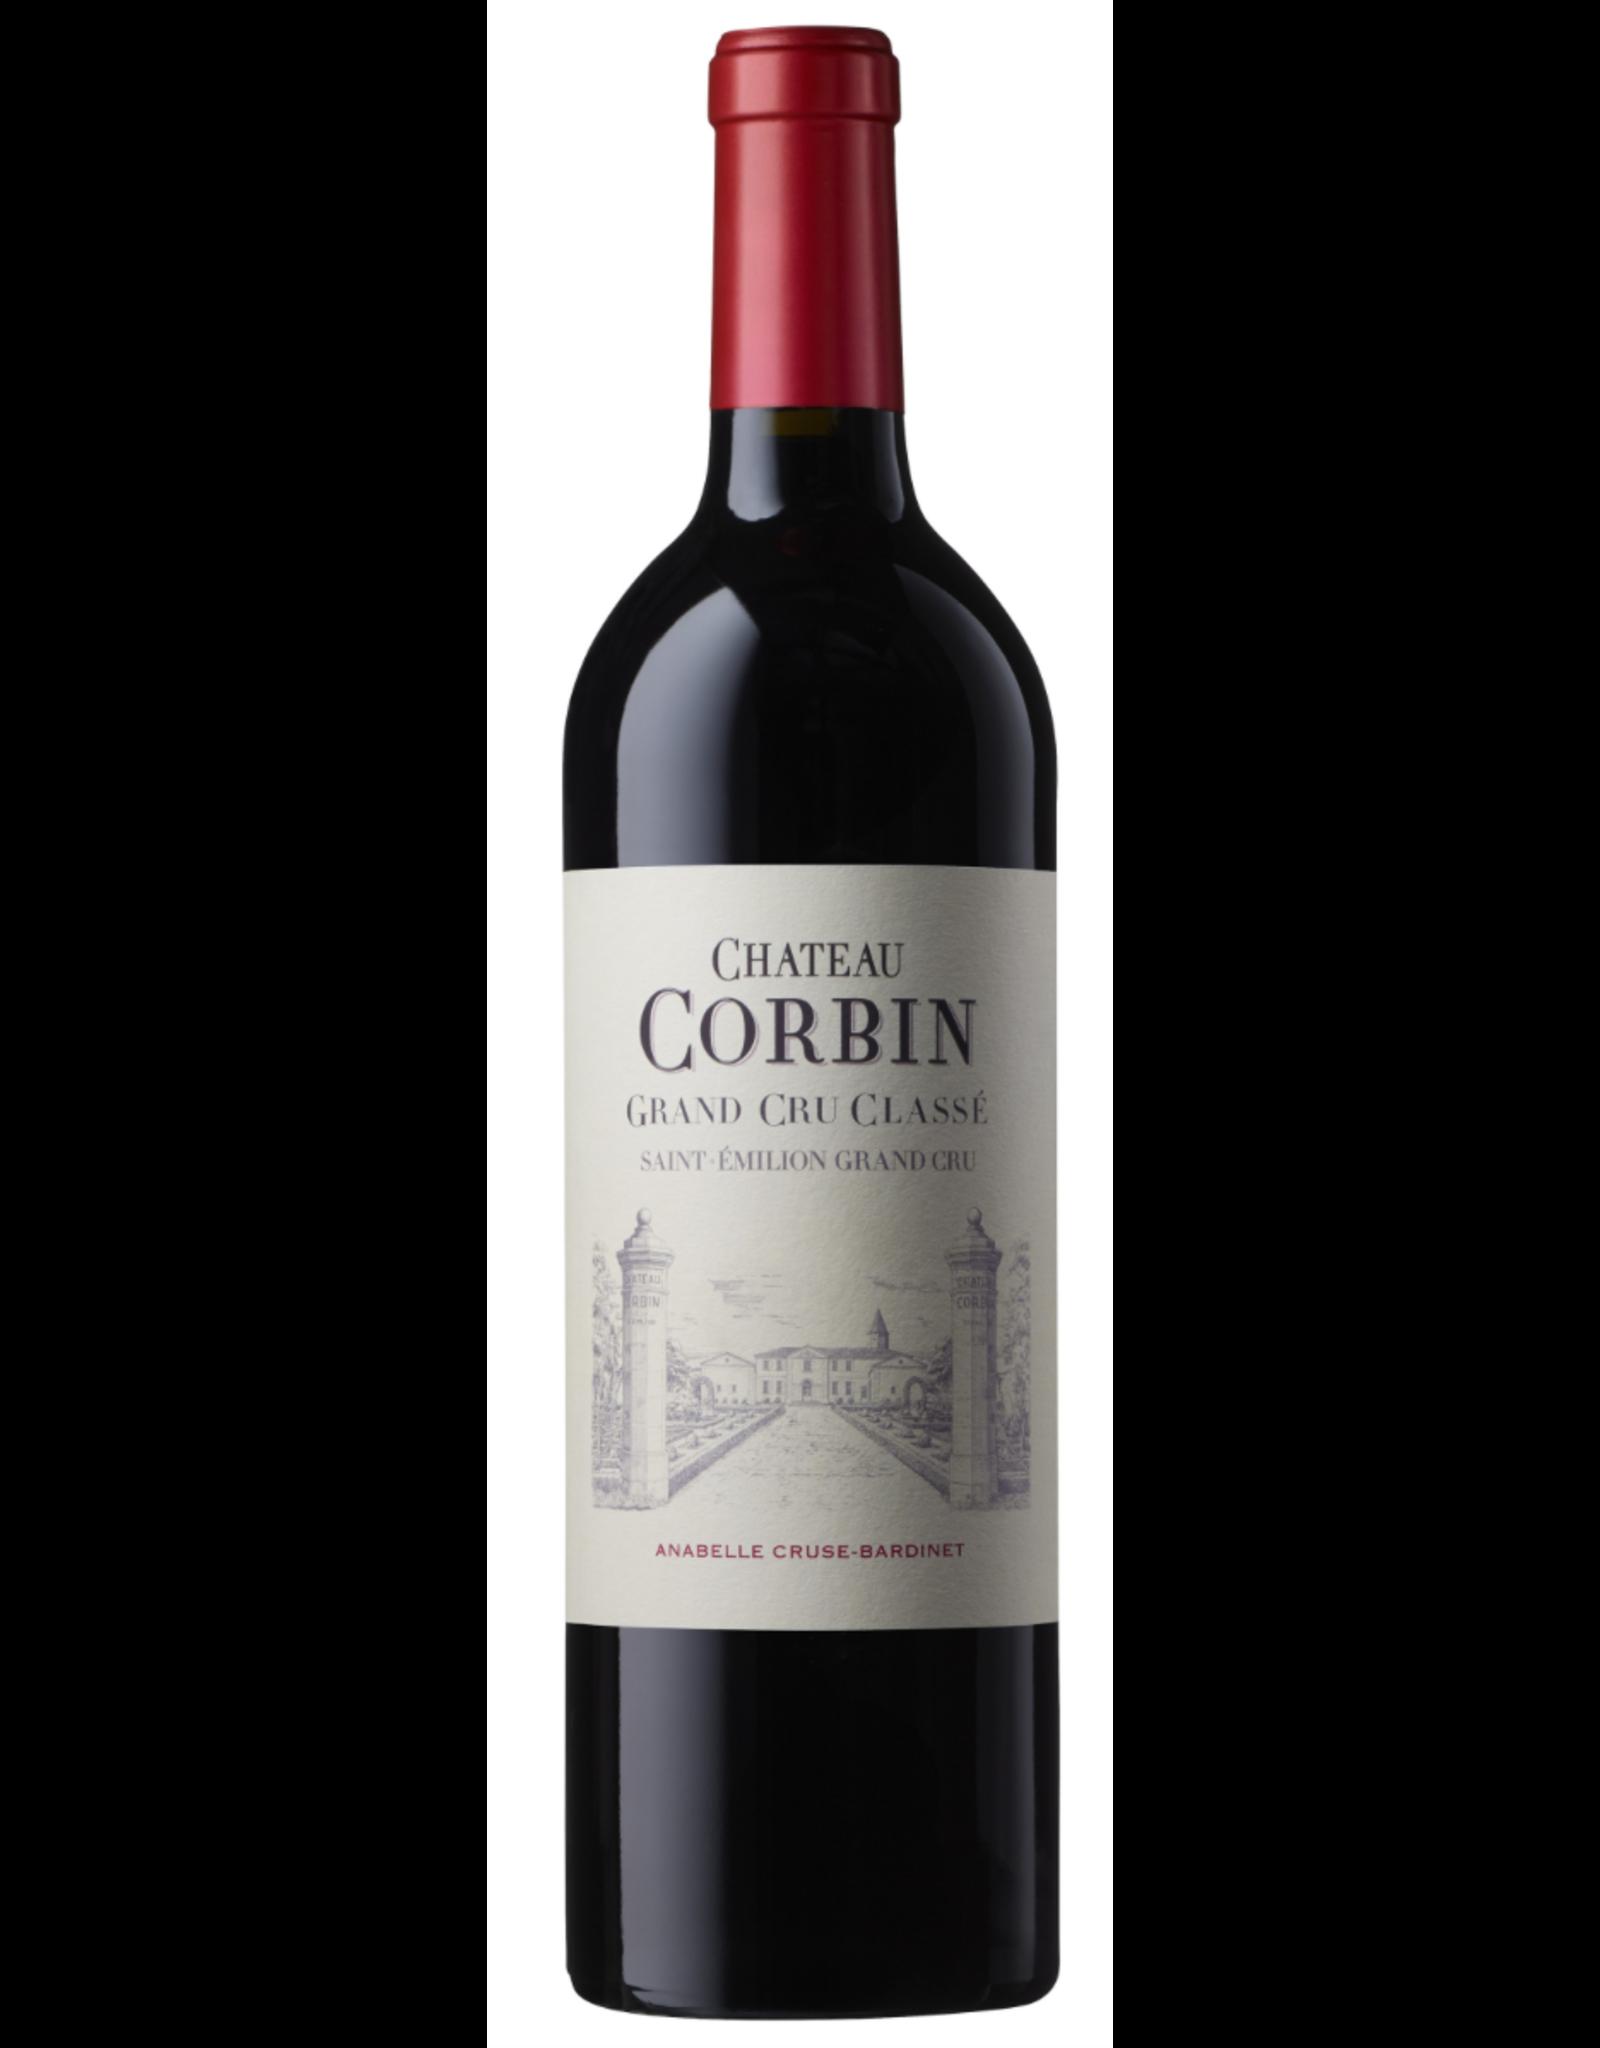 Château Corbin Château Corbin 2018 - 1,5l - St.Emilion